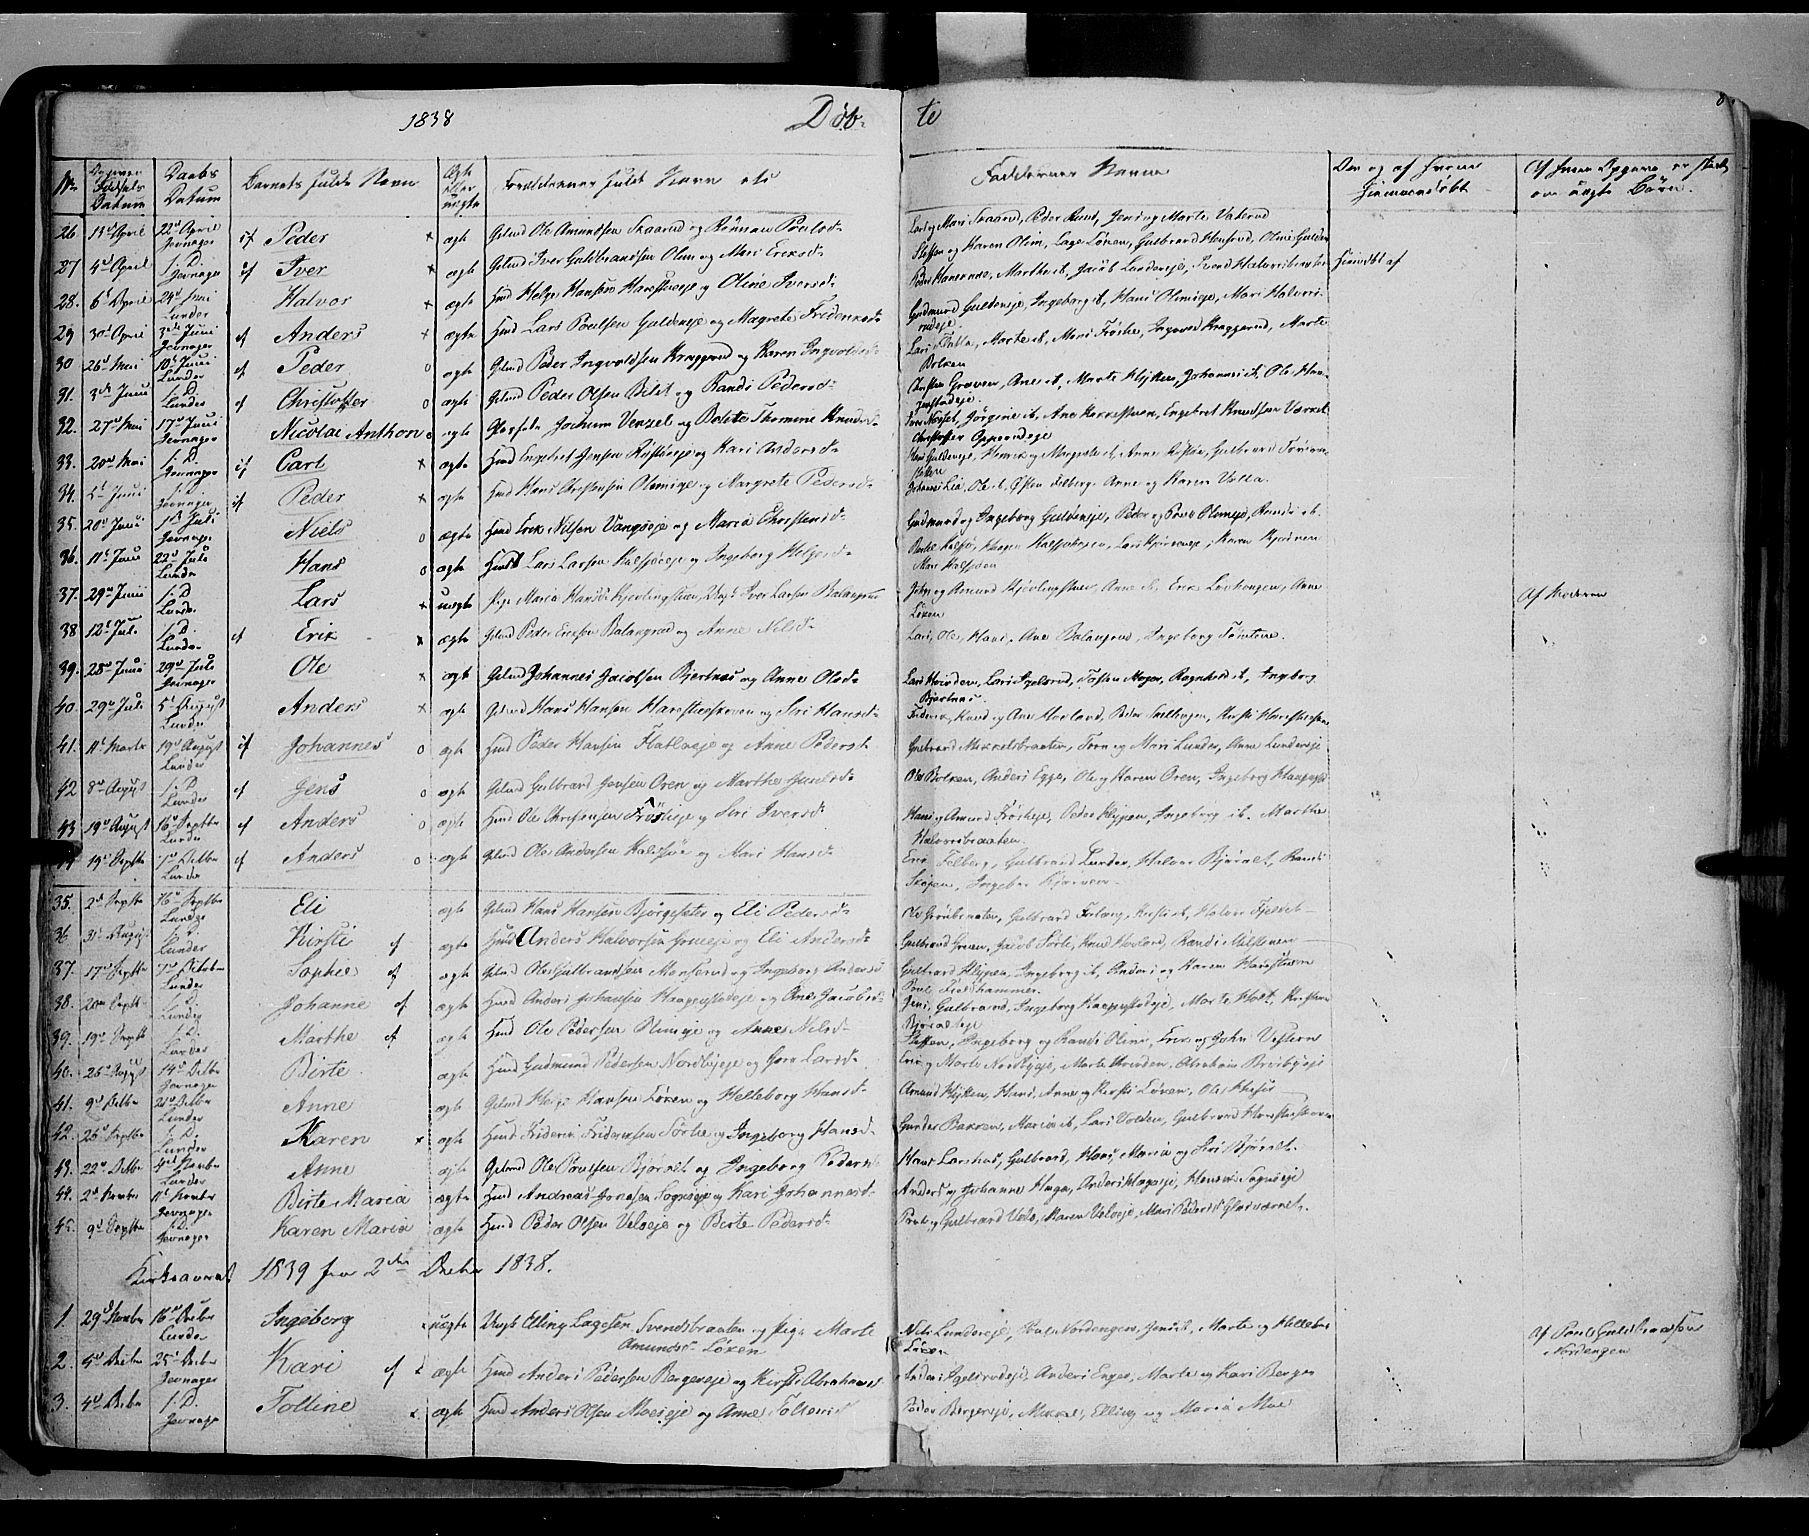 SAH, Jevnaker prestekontor, Ministerialbok nr. 6, 1837-1857, s. 8